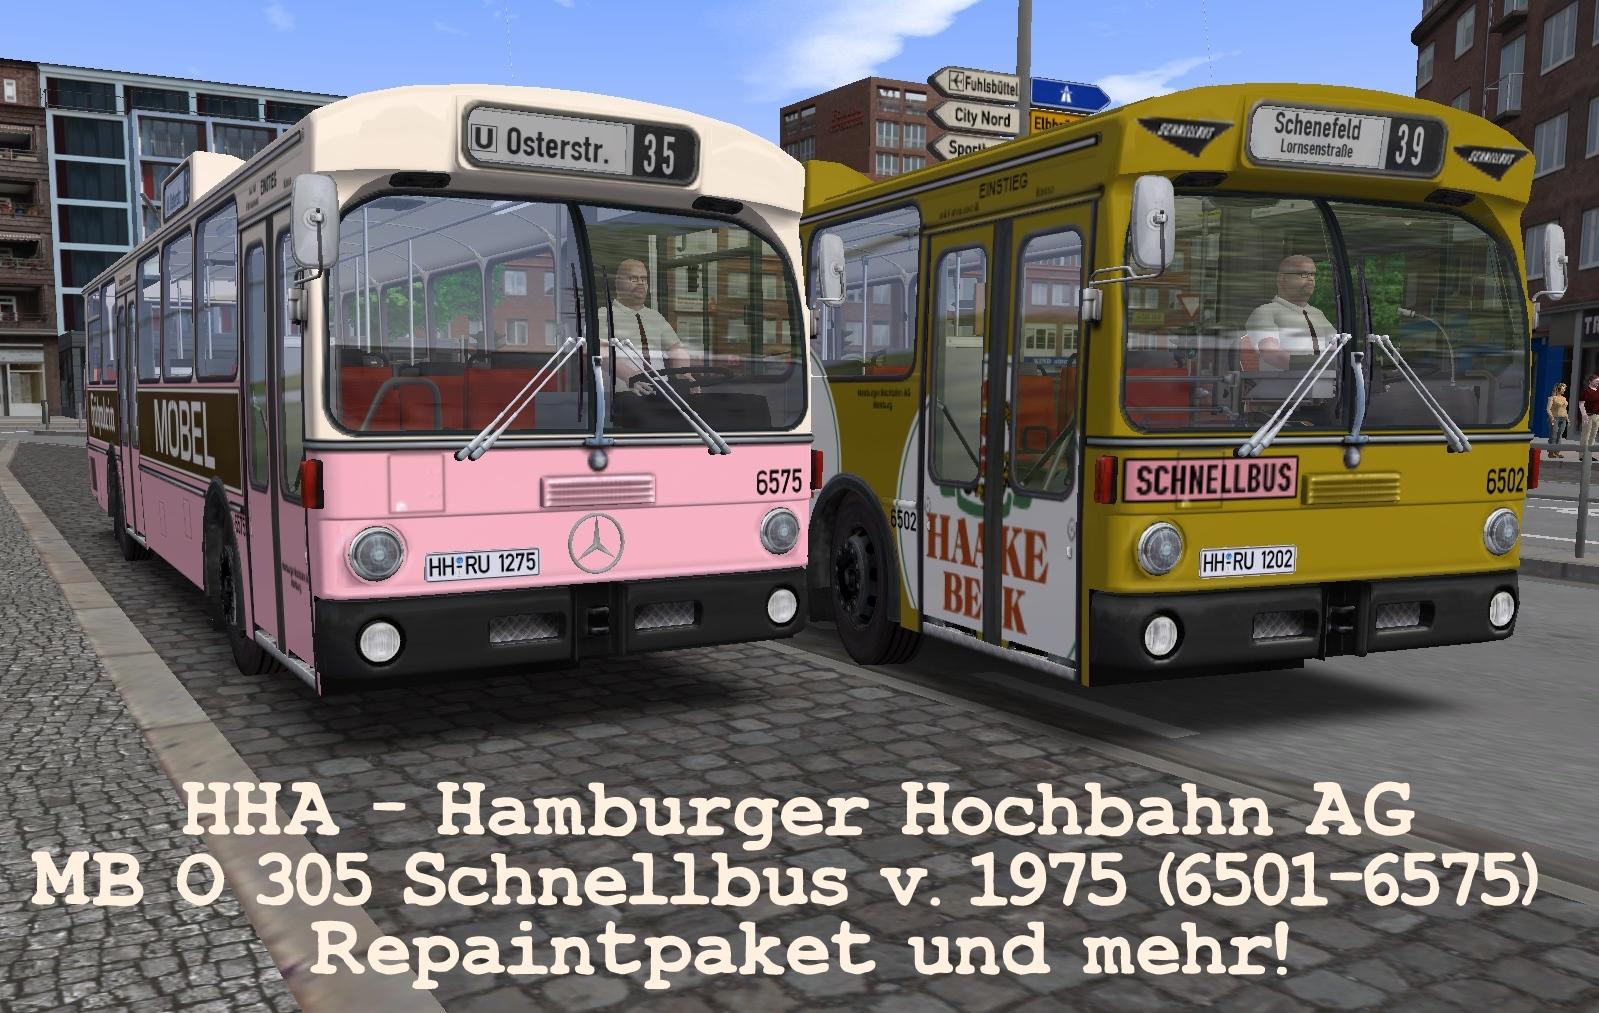 hha_sb_vorschau_1ivsy2.jpg